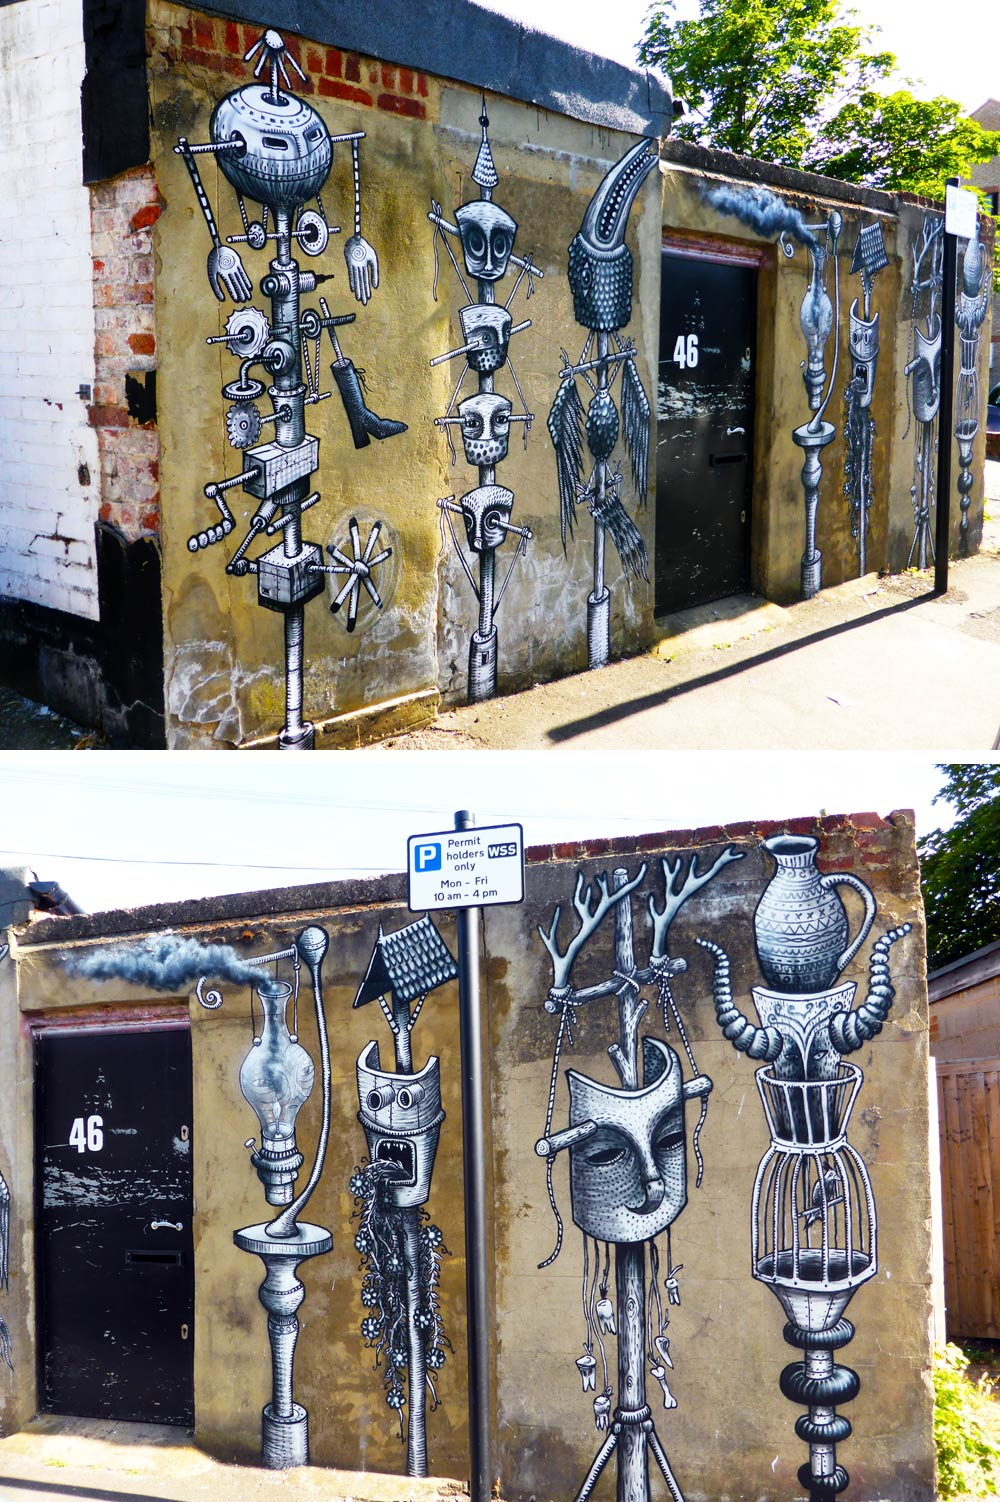 Phlegm street art in Walthamstow